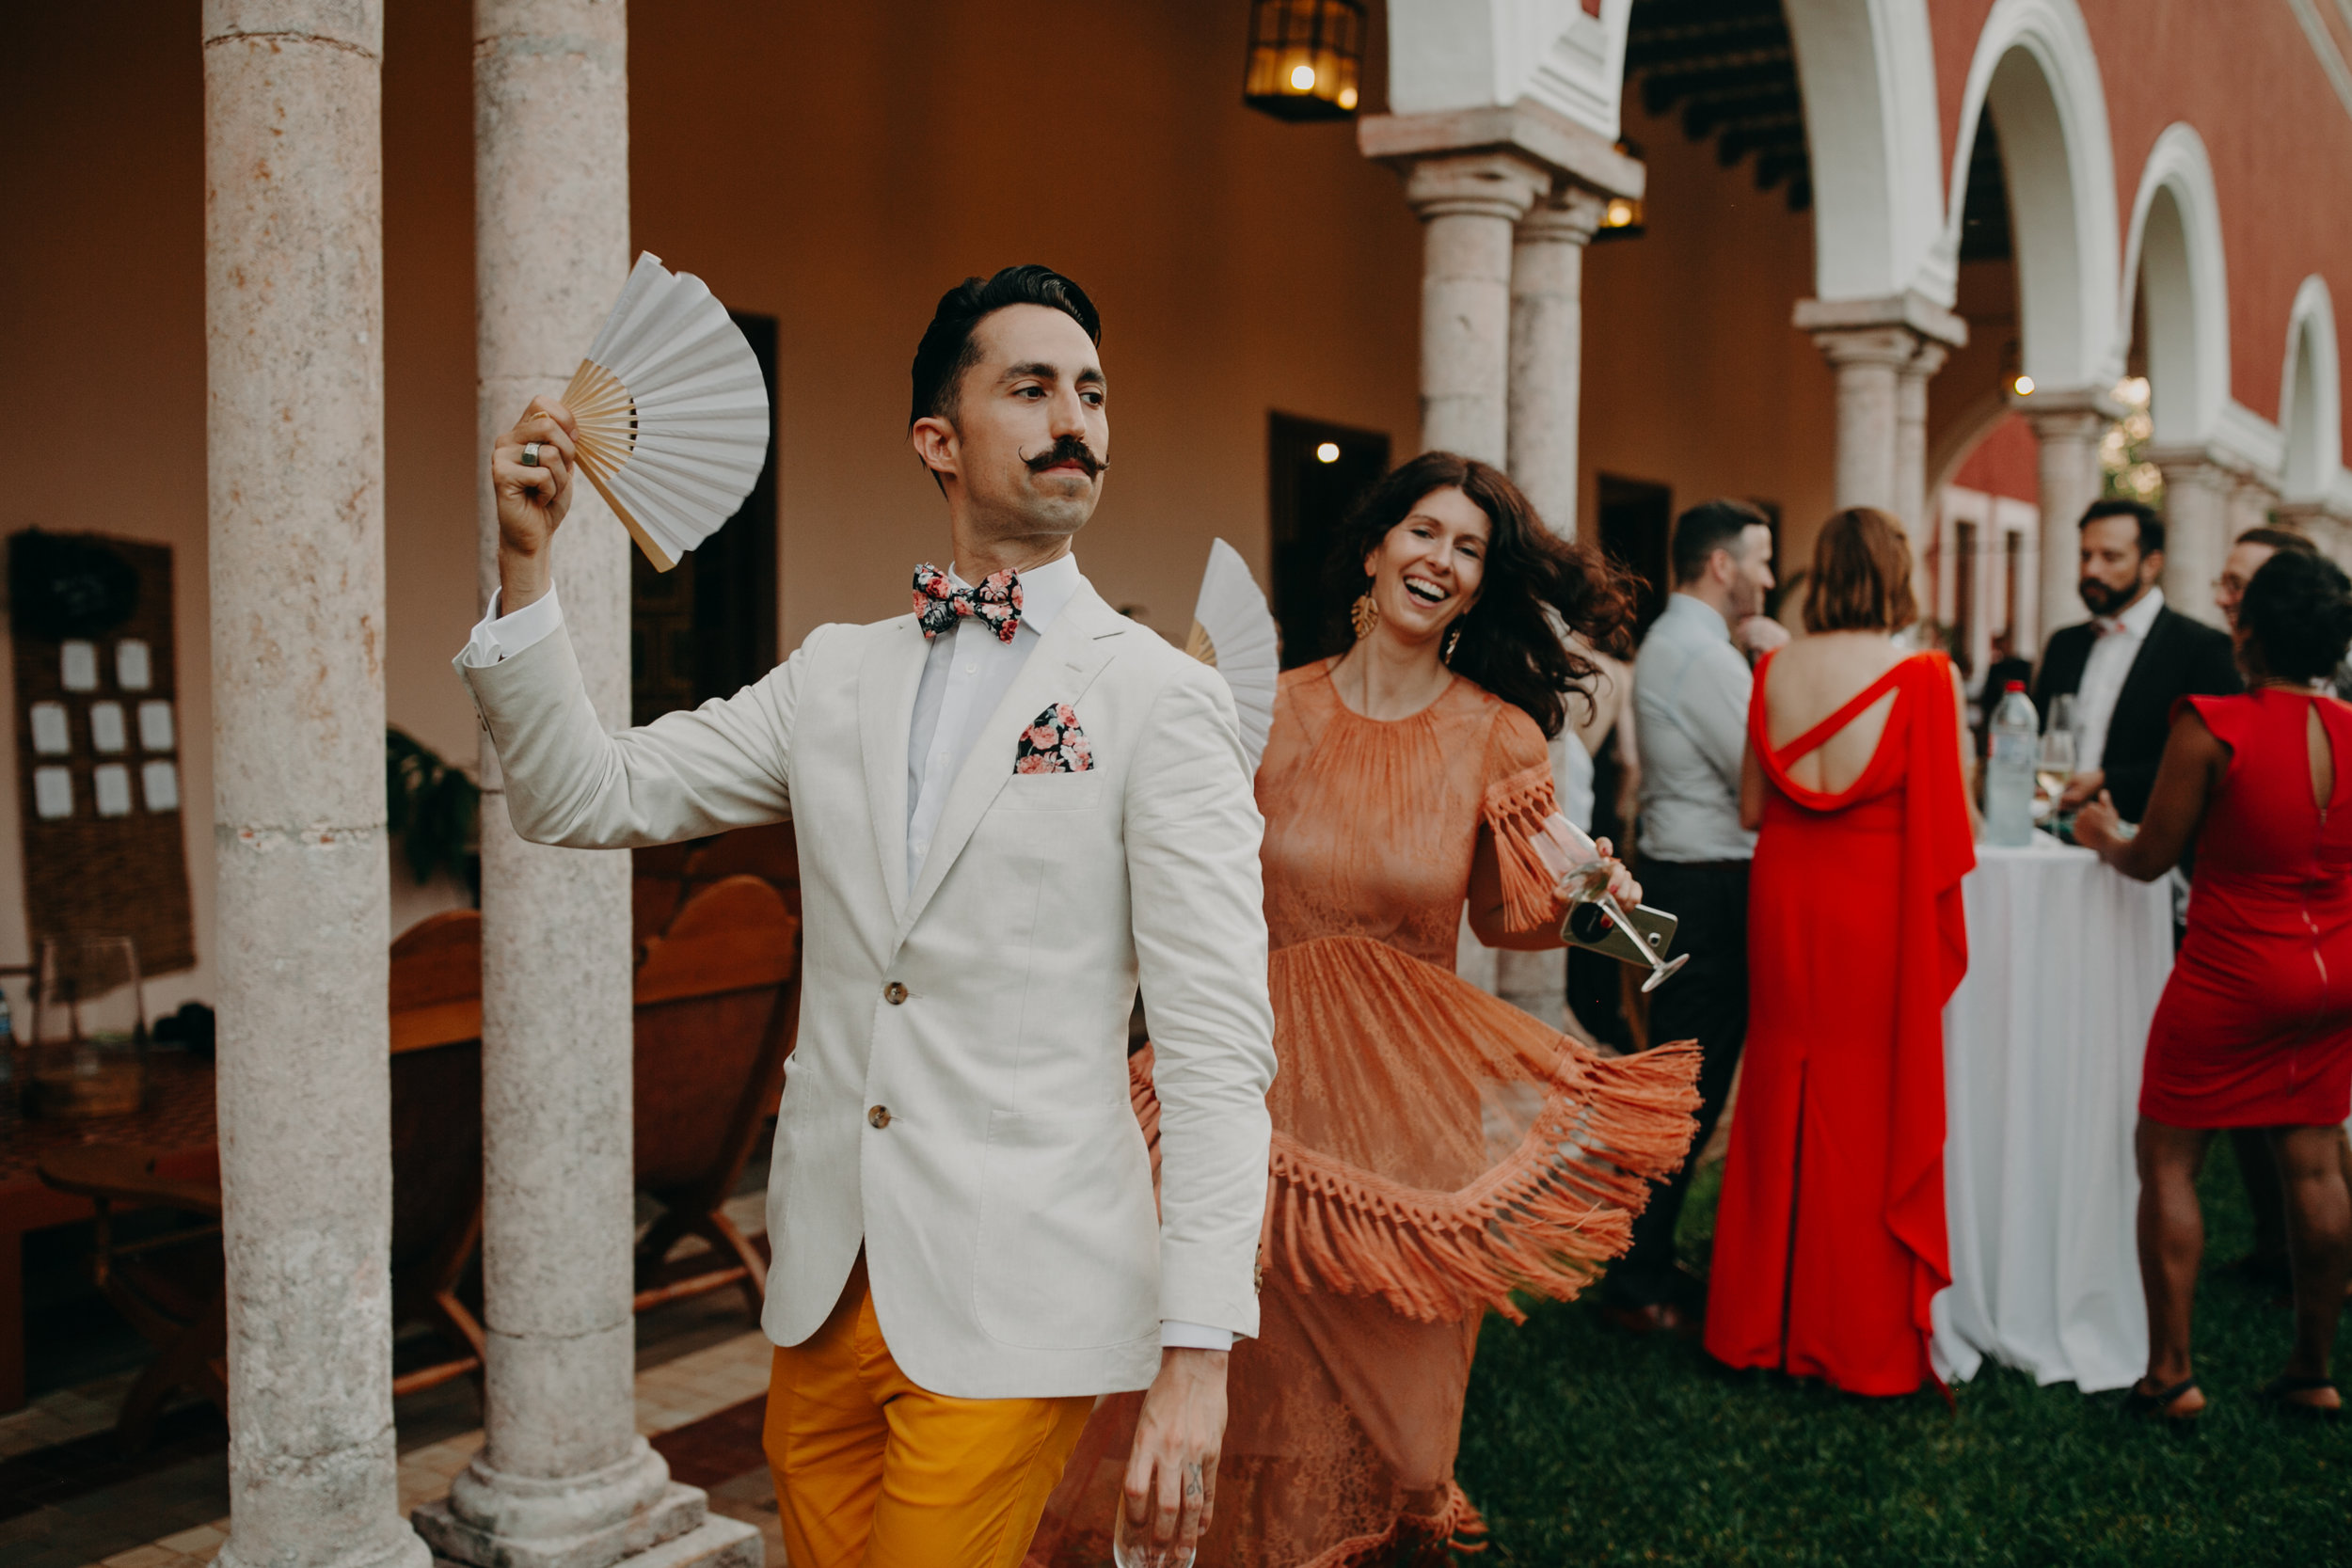 Hacienda Temozon Yucatan Mexico Wedding | Ida & Peter Emily Magers Photography-1278.jpg